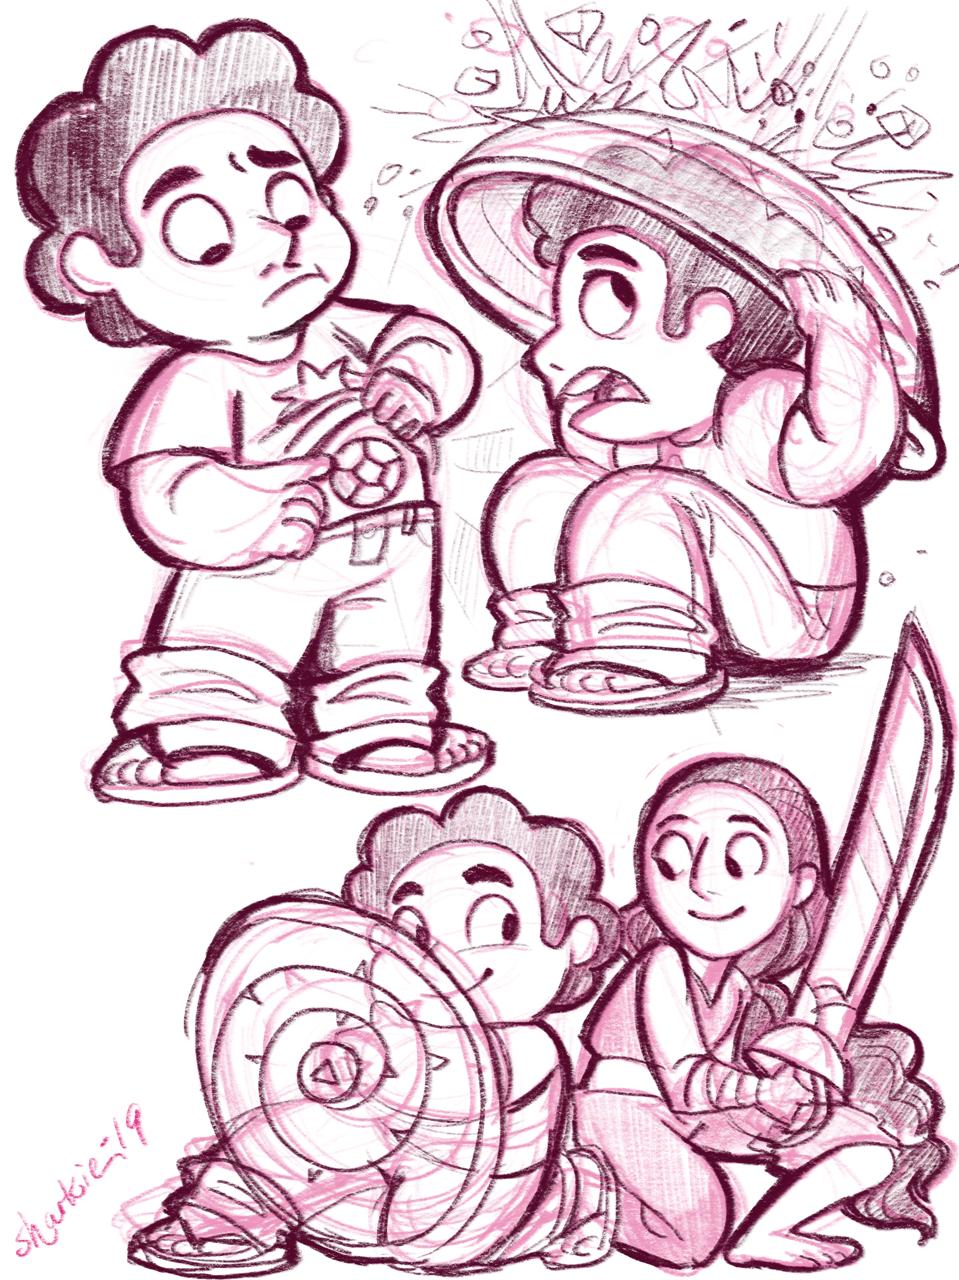 Steven doodles.